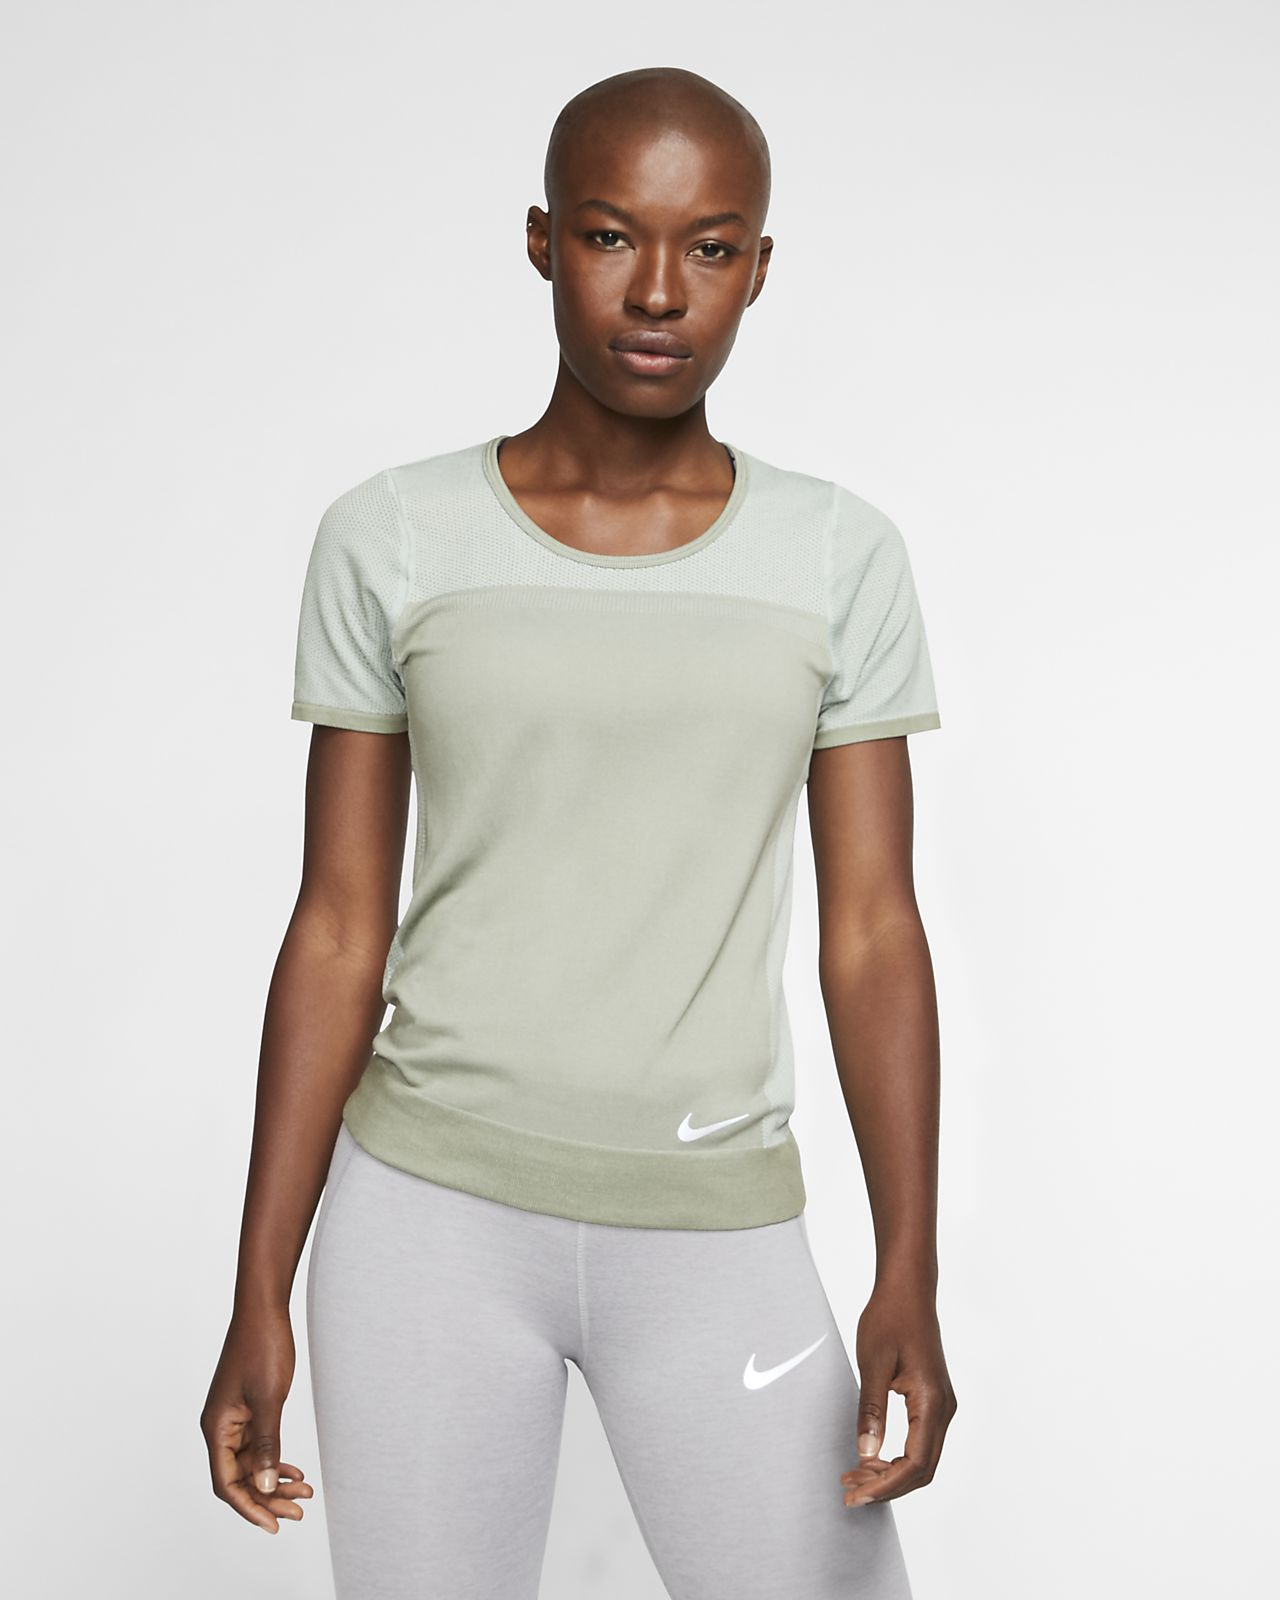 Женская беговая футболка с коротким рукавом Nike Infinite